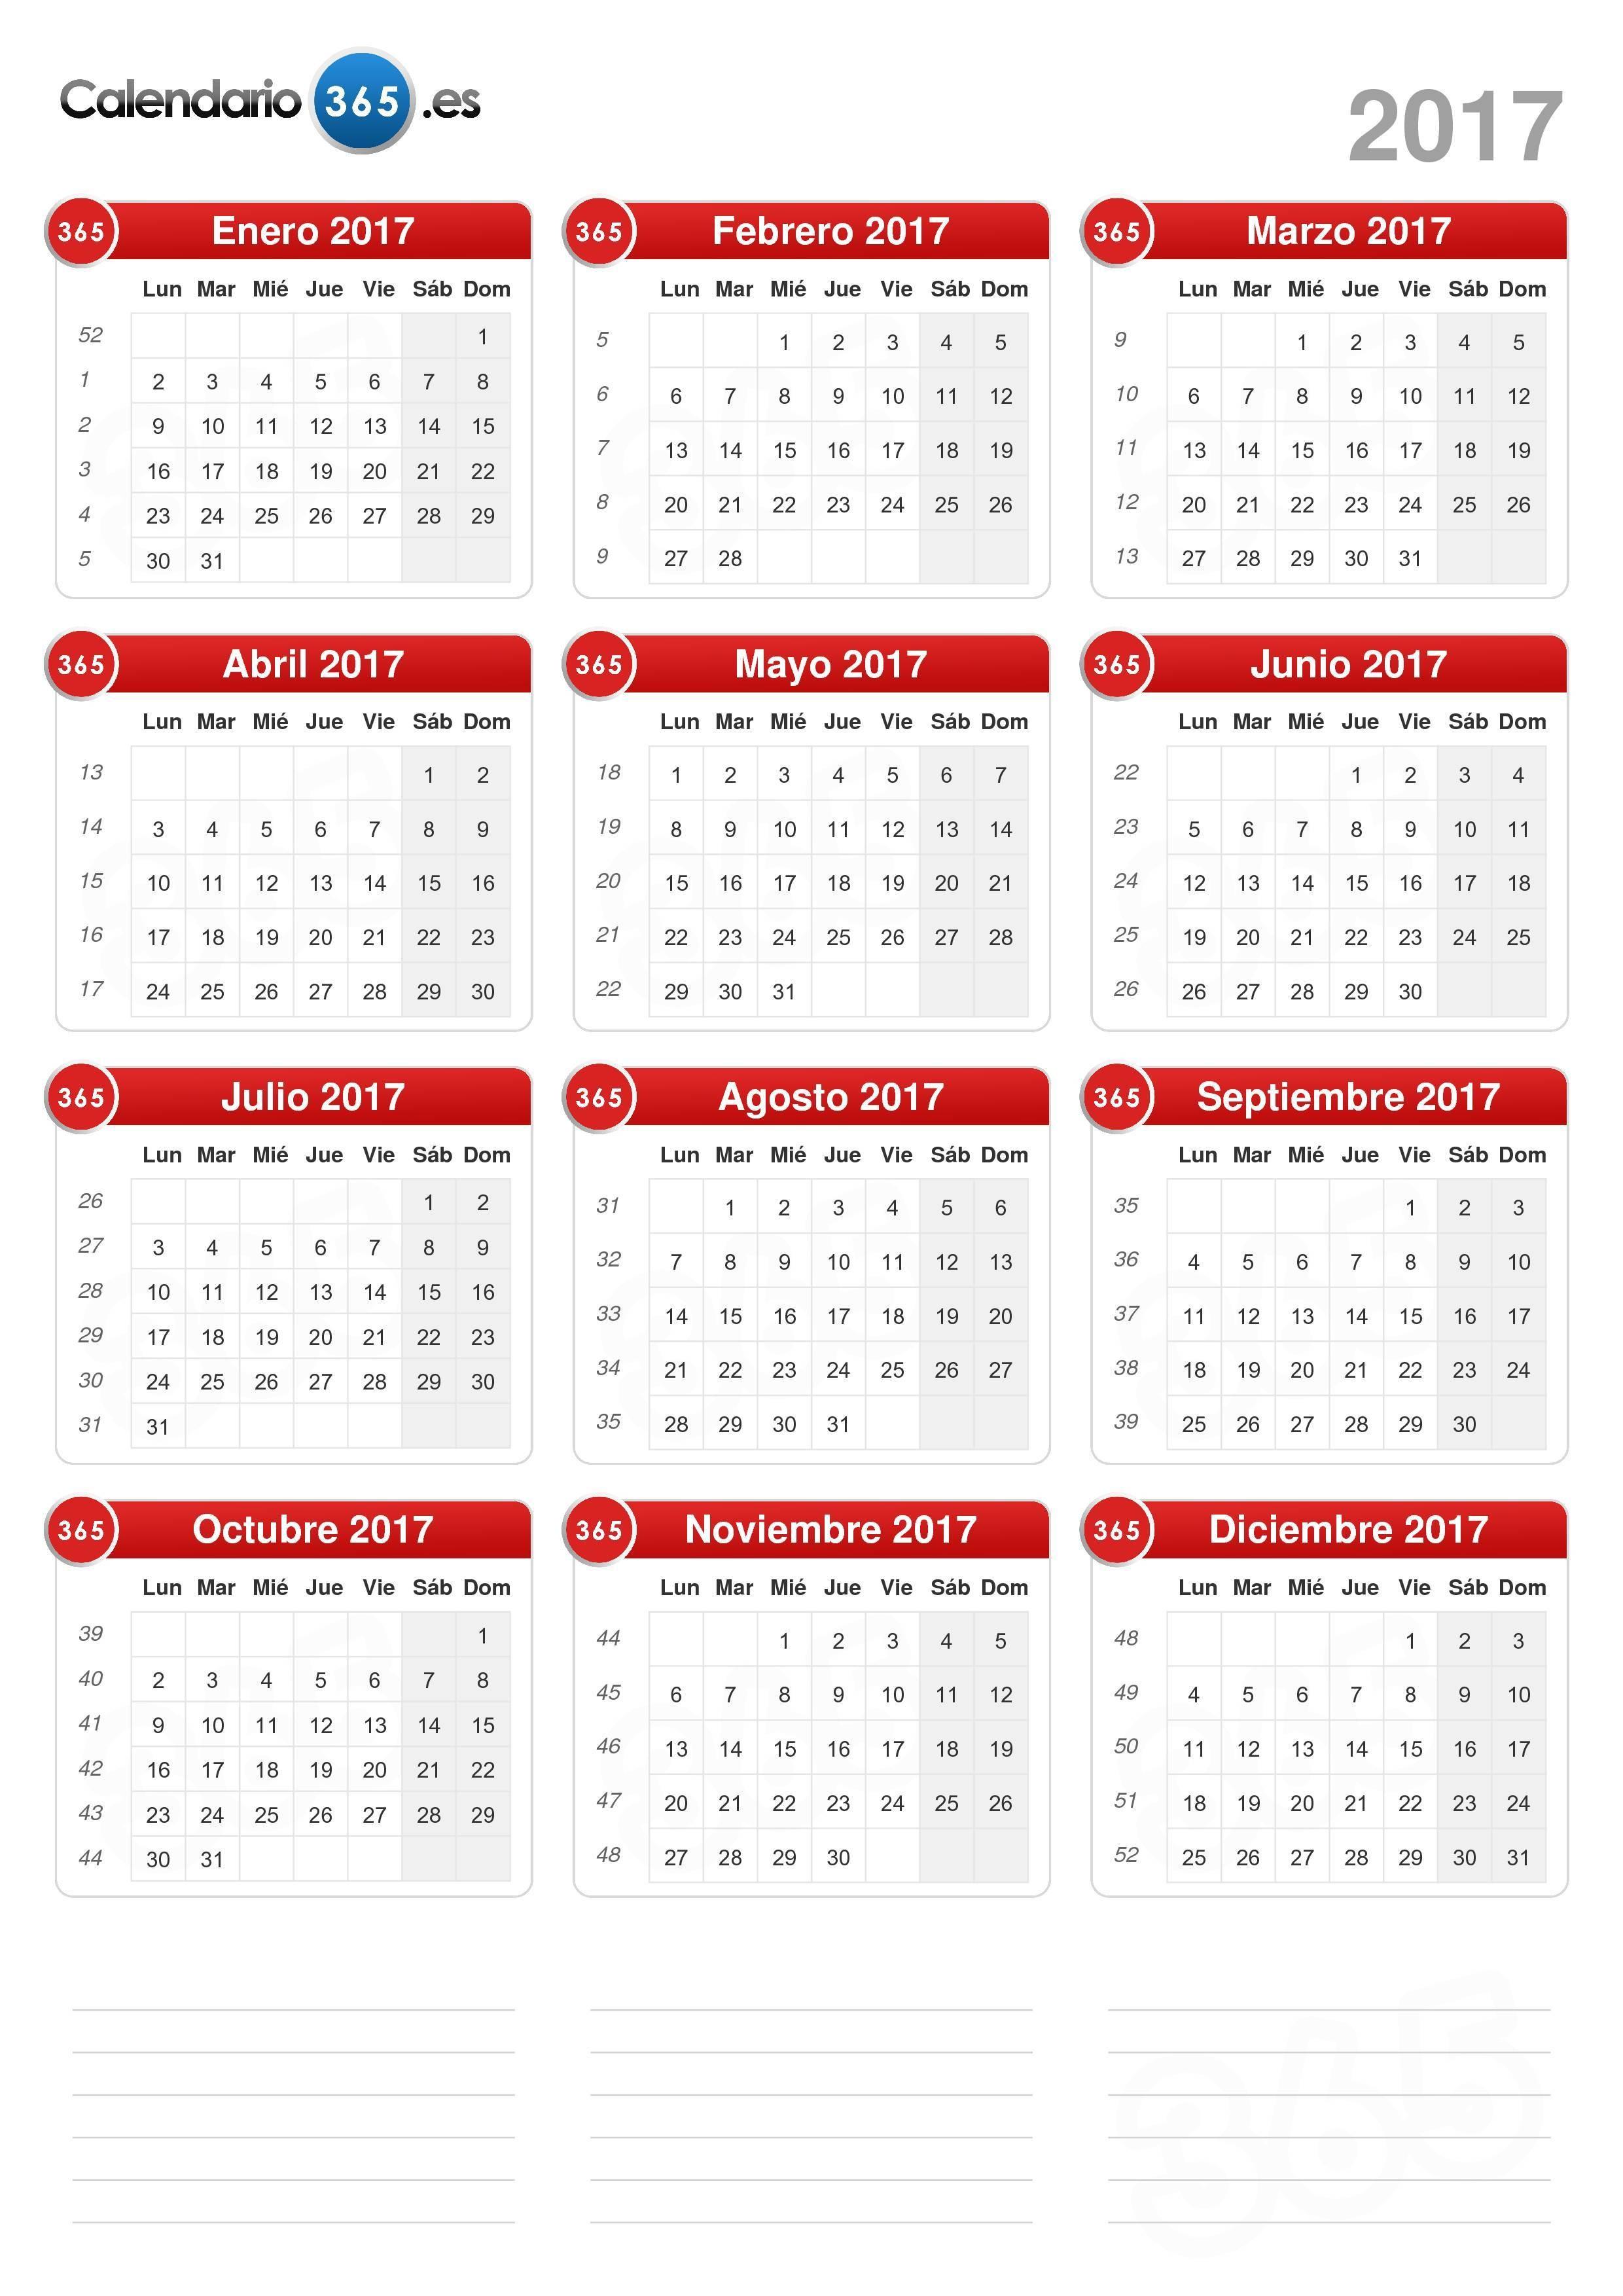 Calendário 2019 Feriados Portugal Más Actual Calendario 2017 Of Calendário 2019 Feriados Portugal Más Recientes Cultura E sociedade Setembro 2018